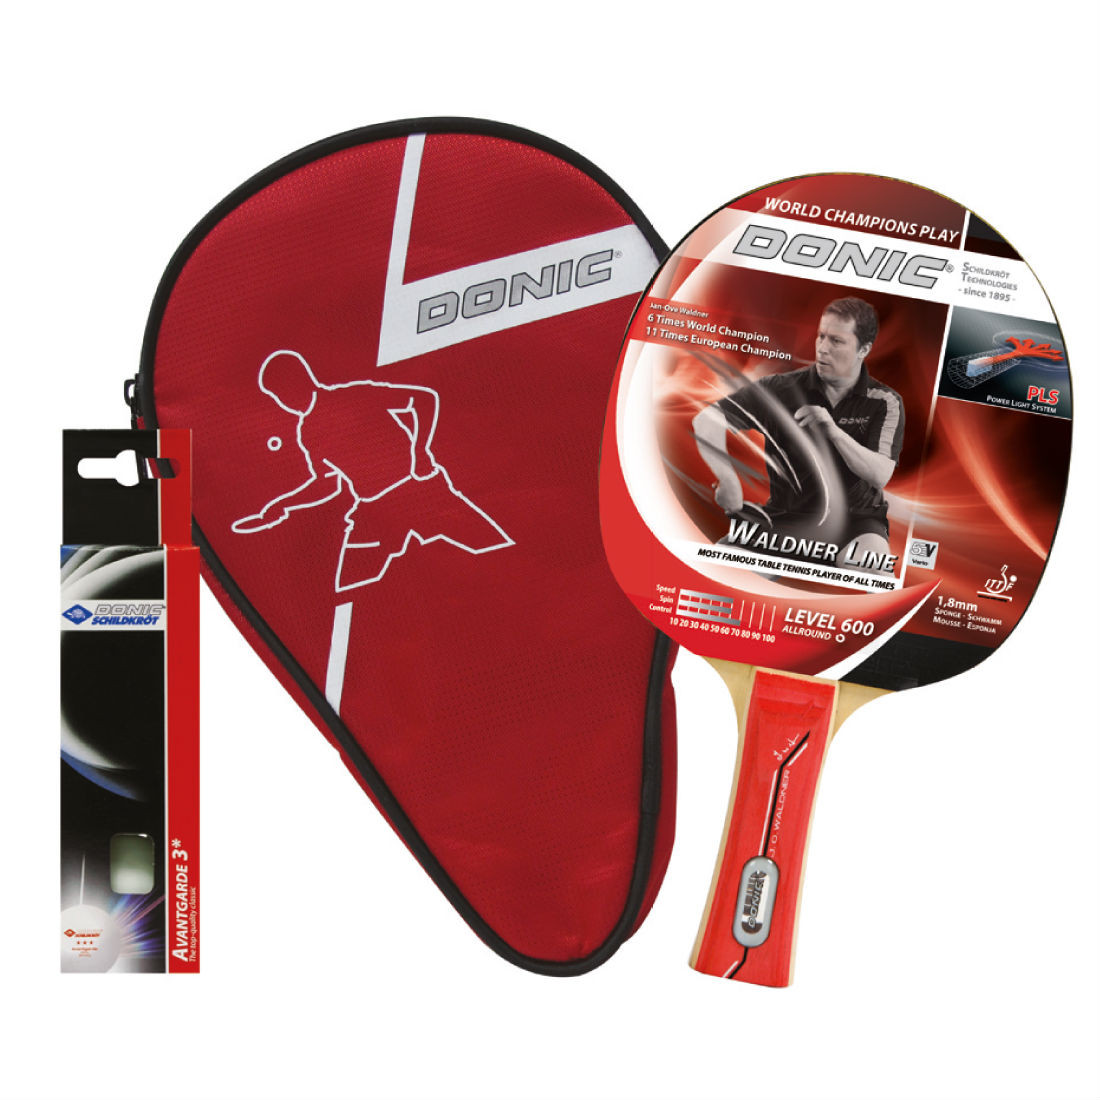 Набір для пінг-понгу Donic Waldner 600 Gift set ракетка+чохол+3 м'ячі (788481)